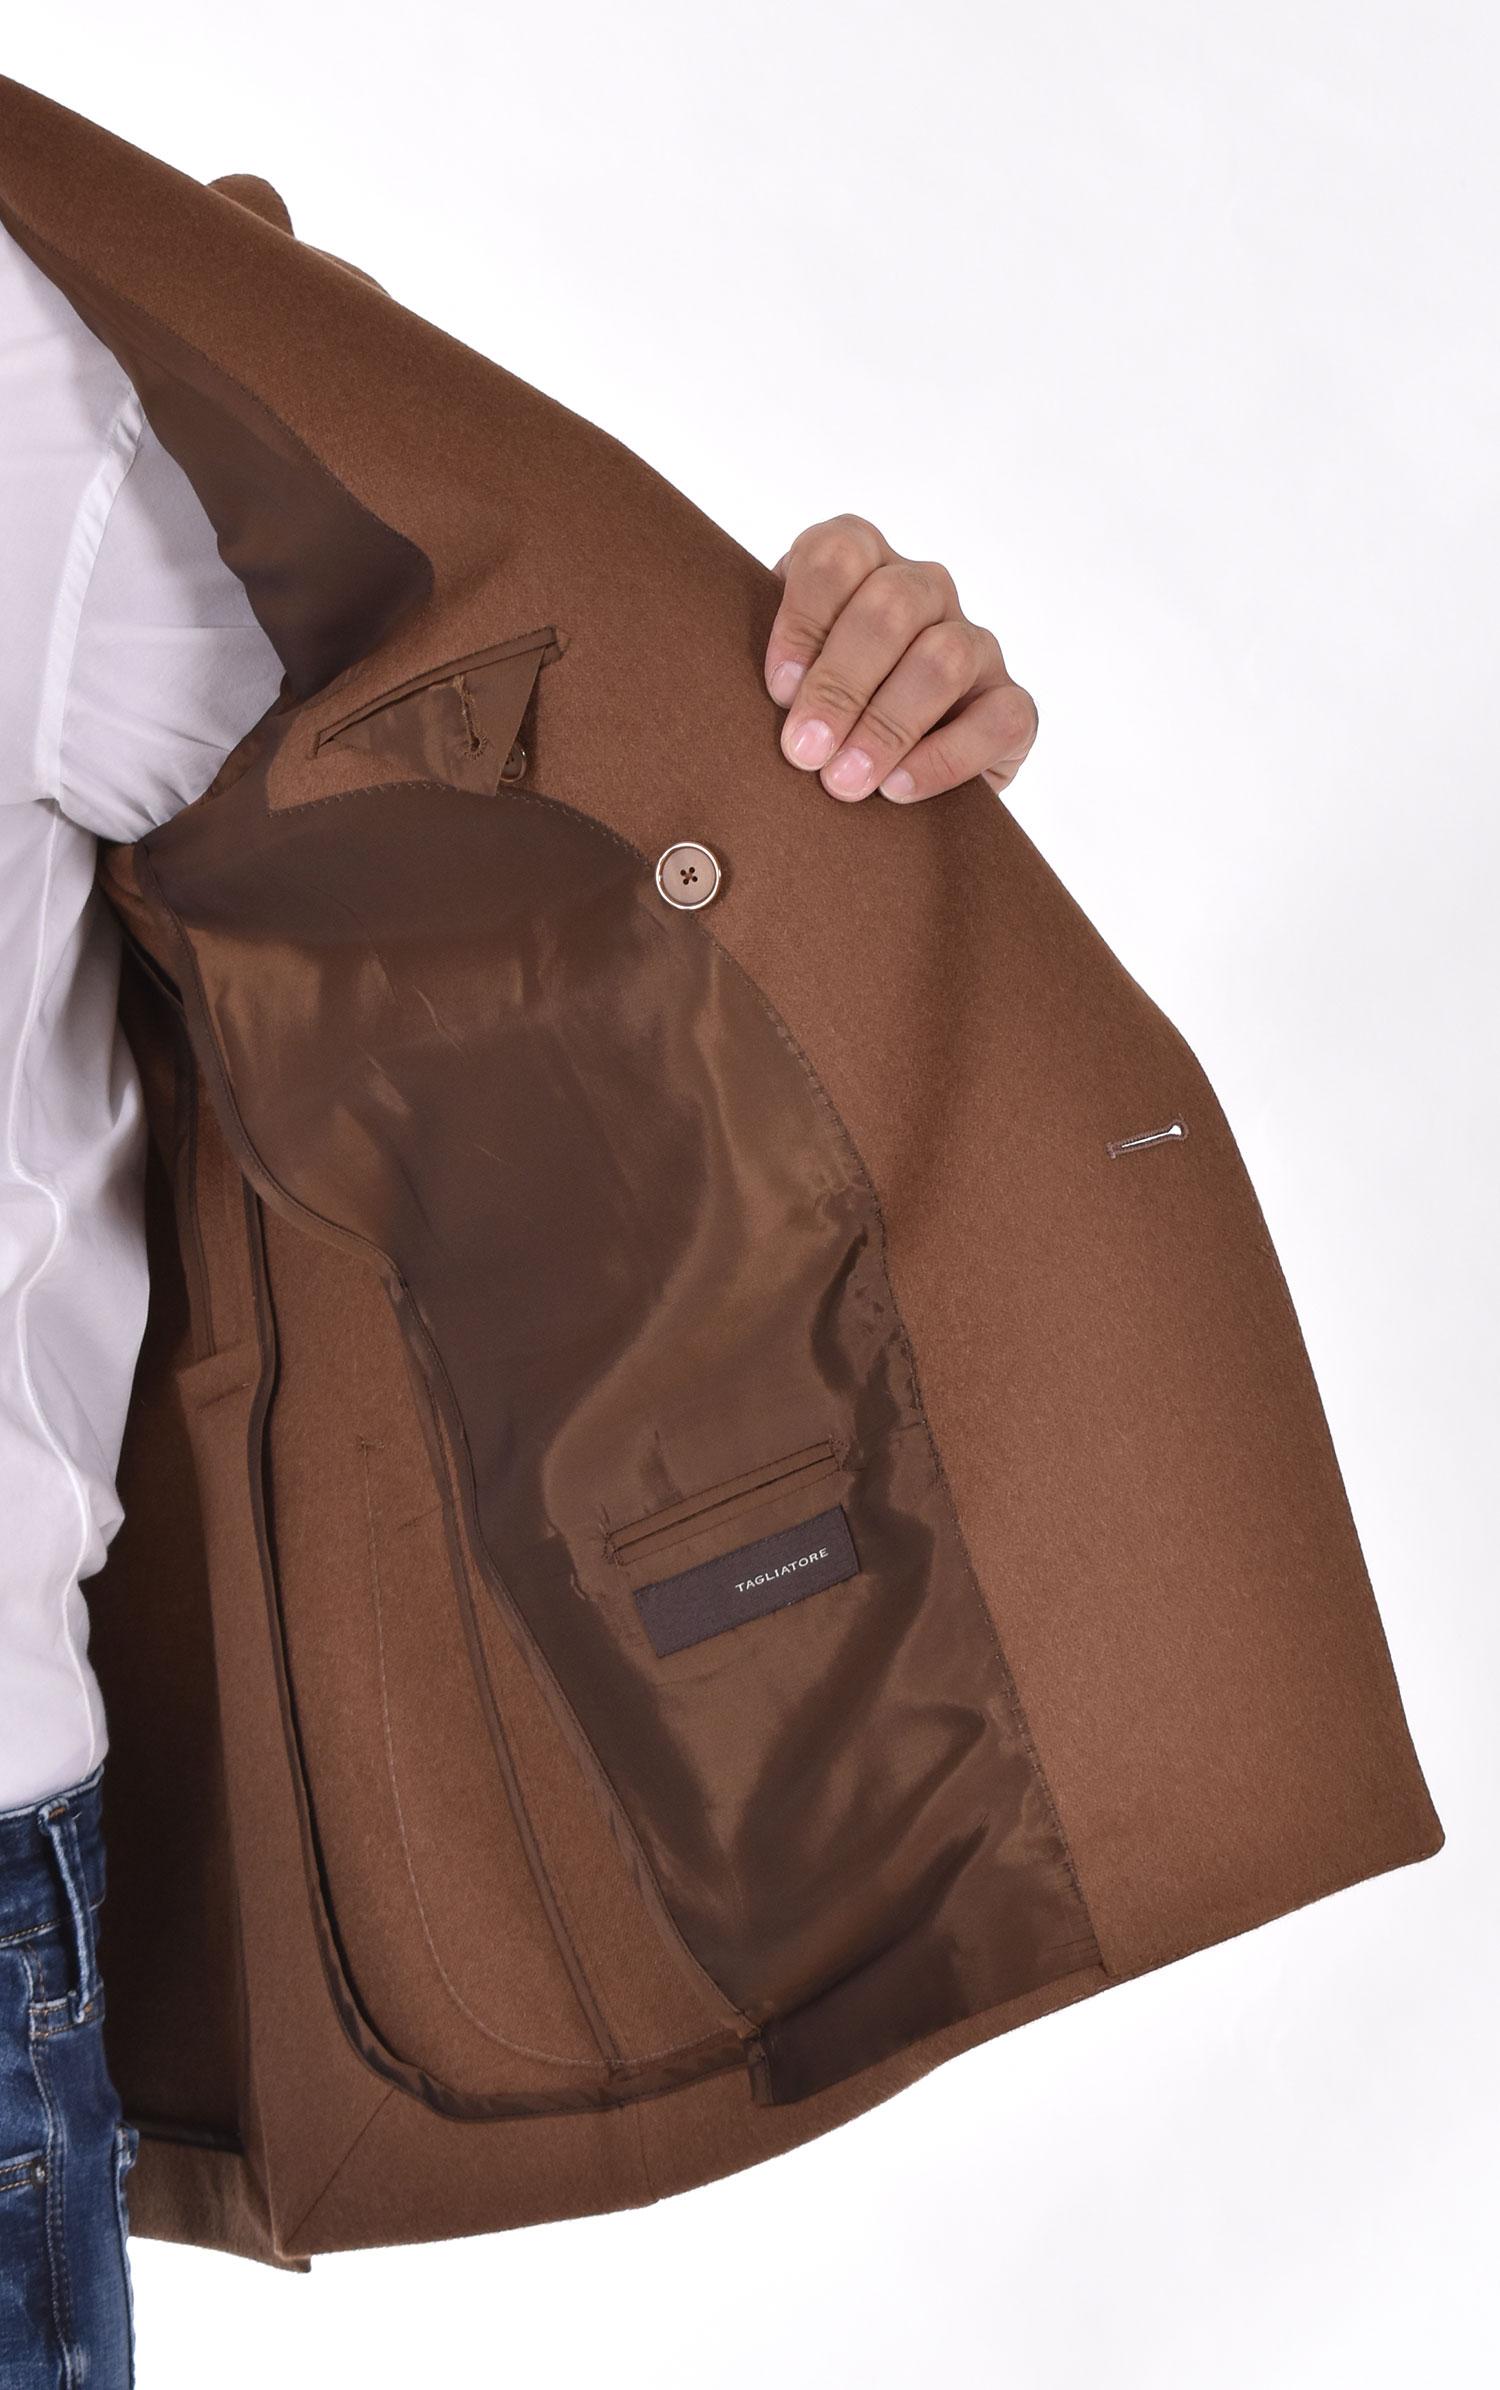 Tagliatore double-breasted camel jacket 1svs20k TAGLIATORE | 1SVS20KM3351